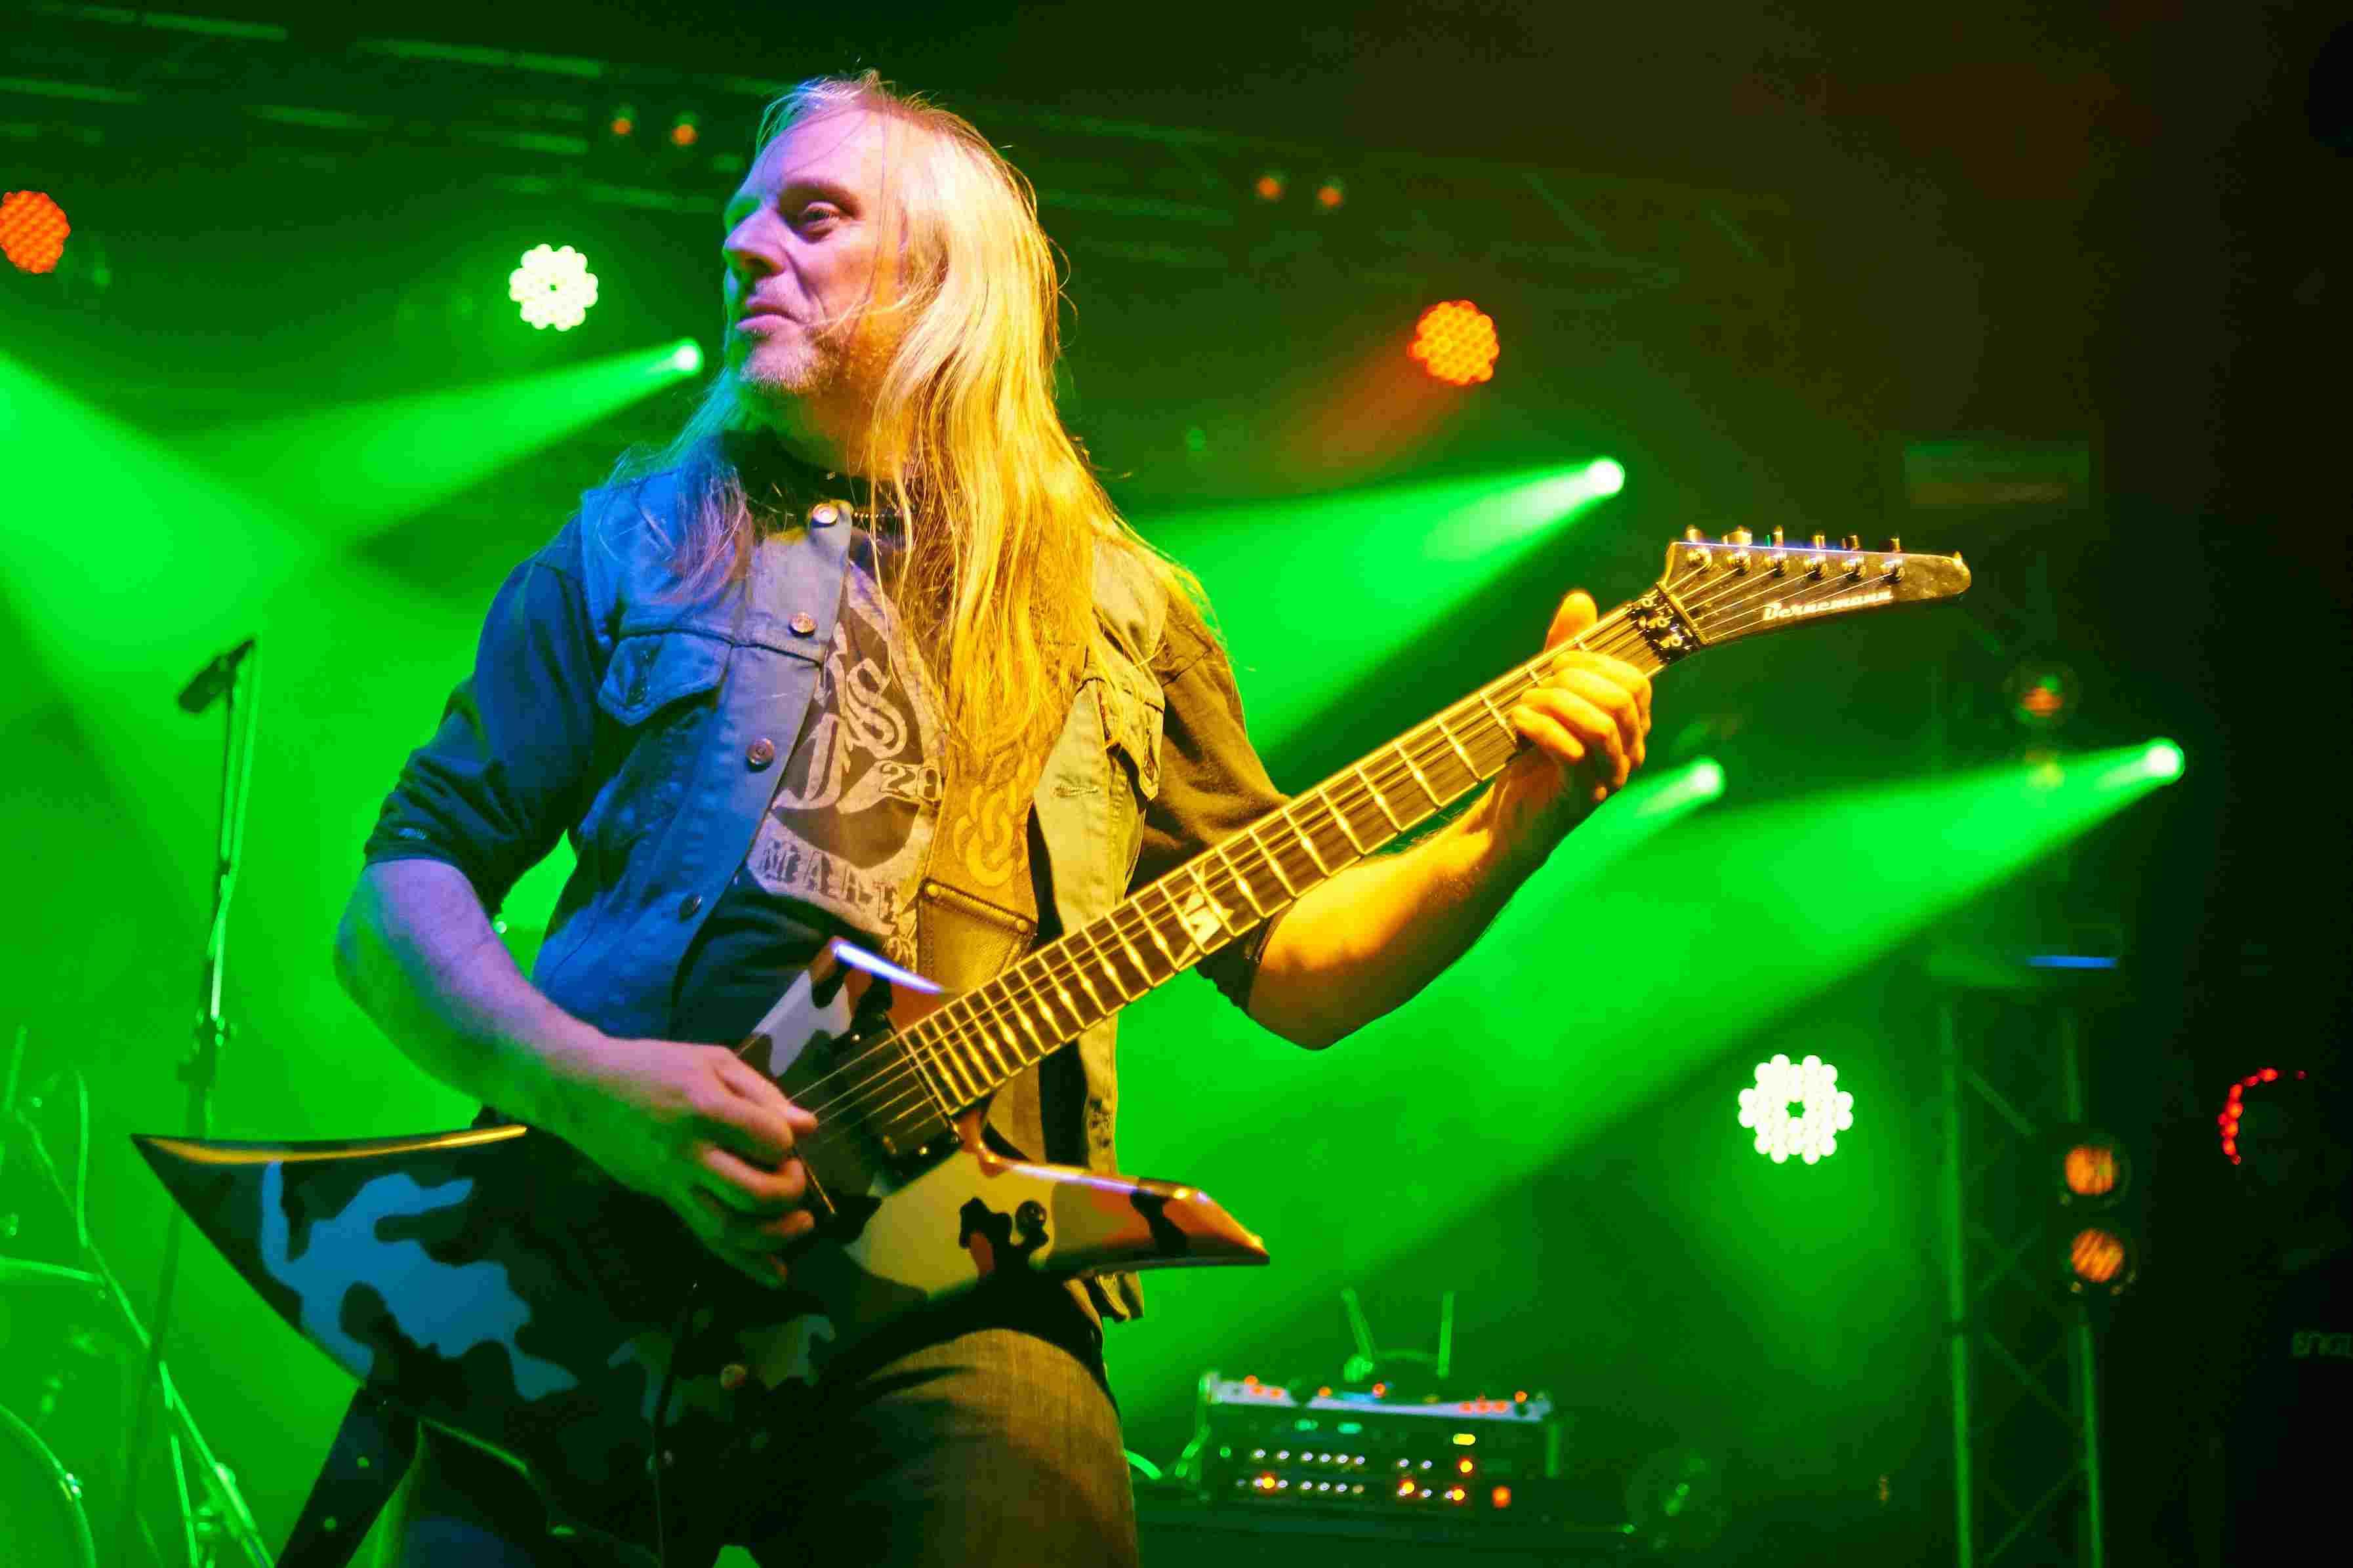 Bernd Kost of Sodom